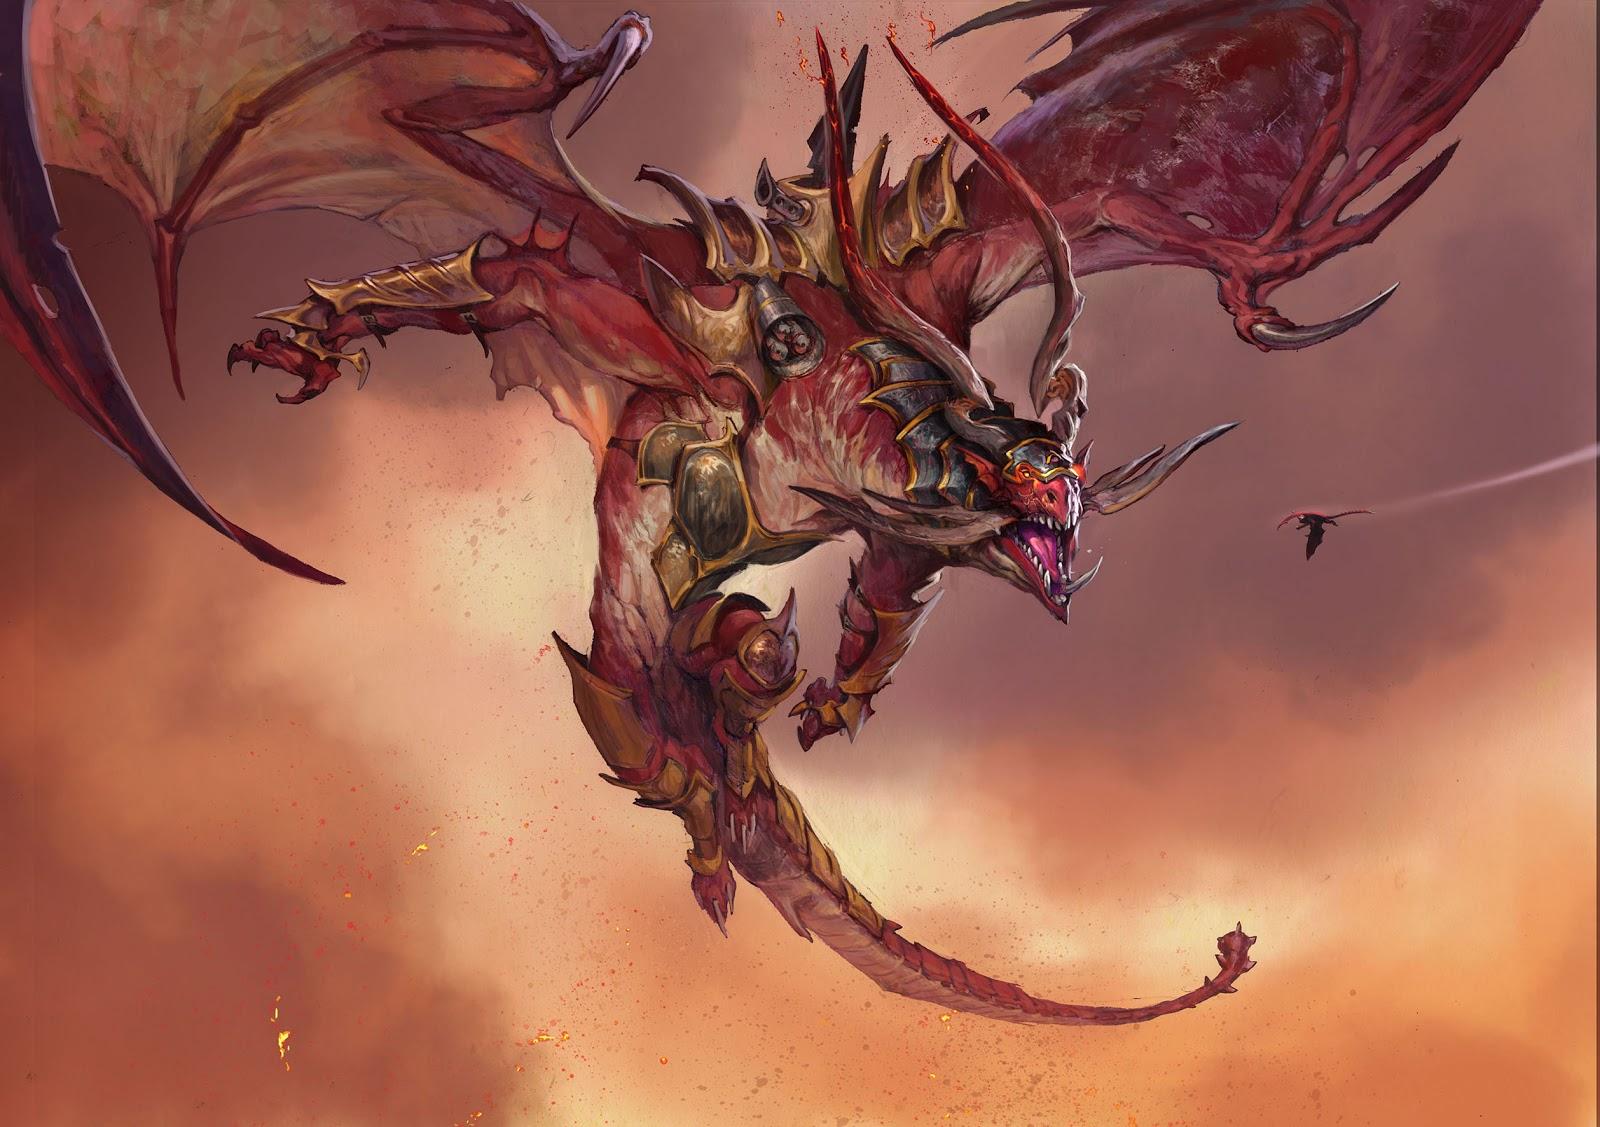 Infernos The Immolator